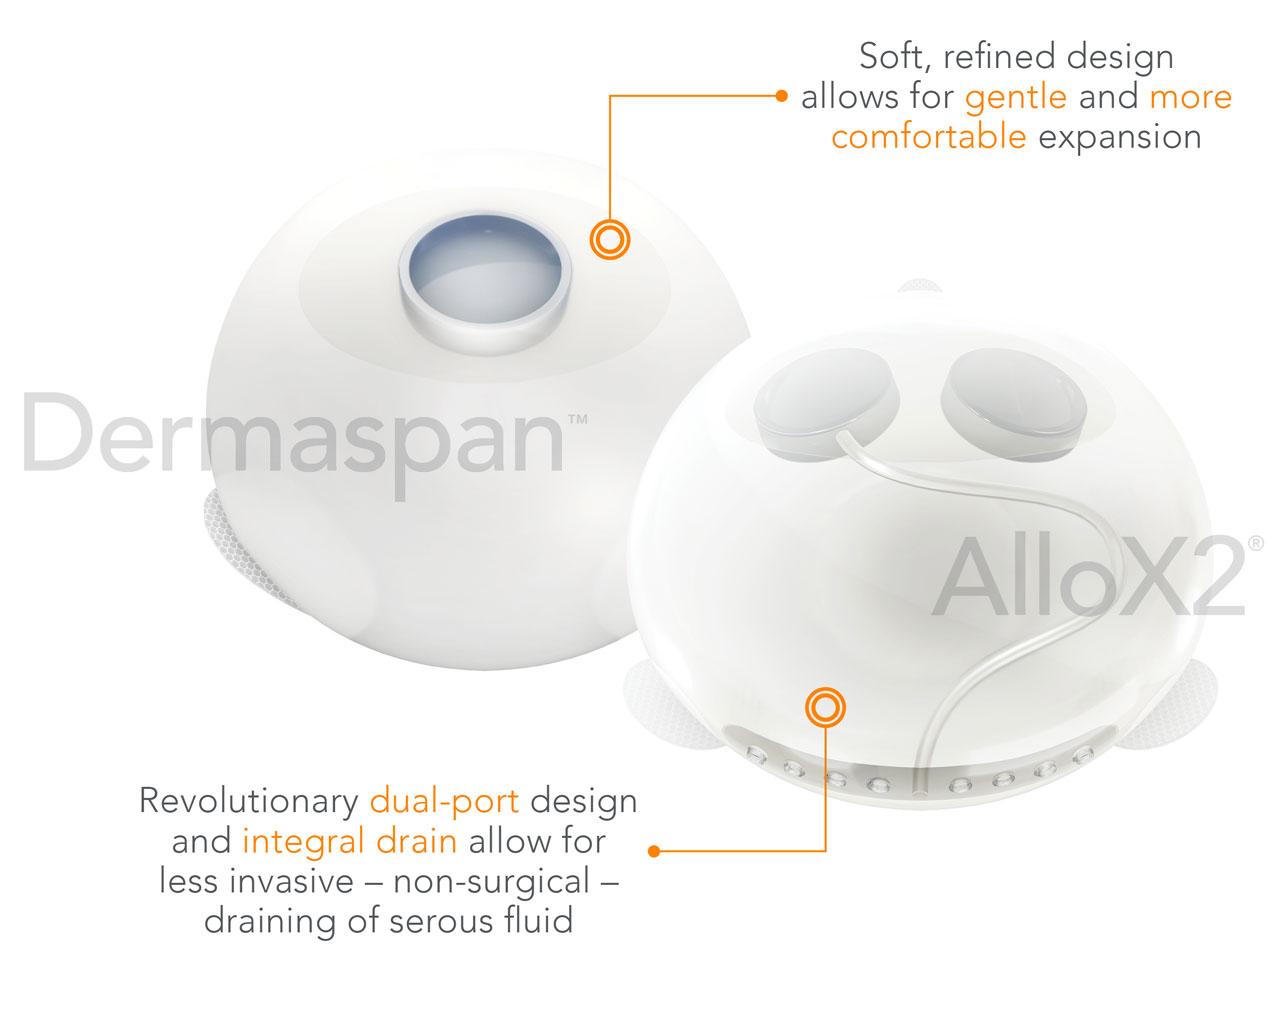 implant-expander-diagram_02